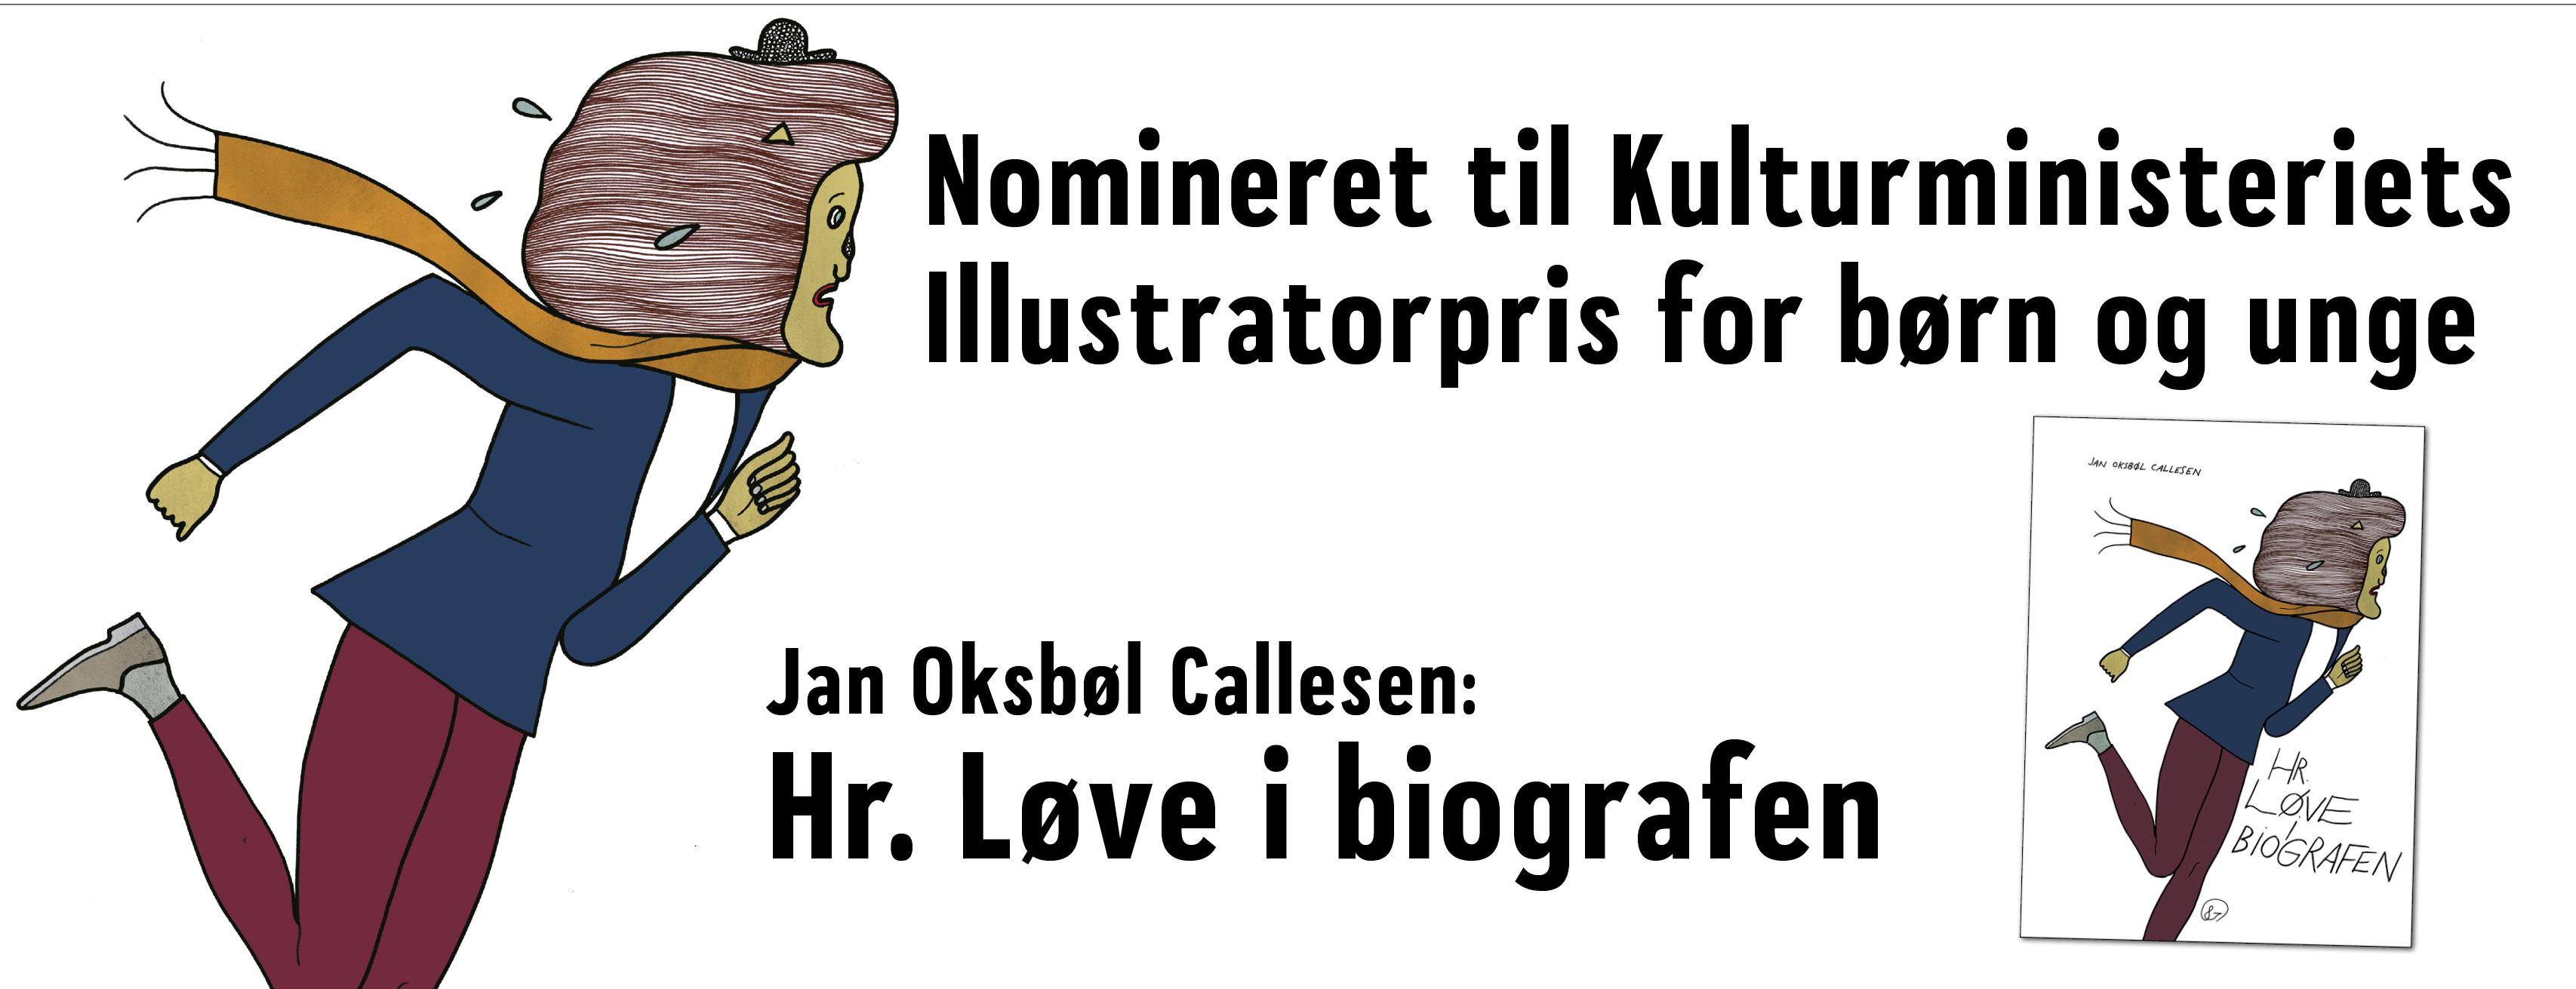 Jan Oksbøl Callesen: Hr. Løve i biografen